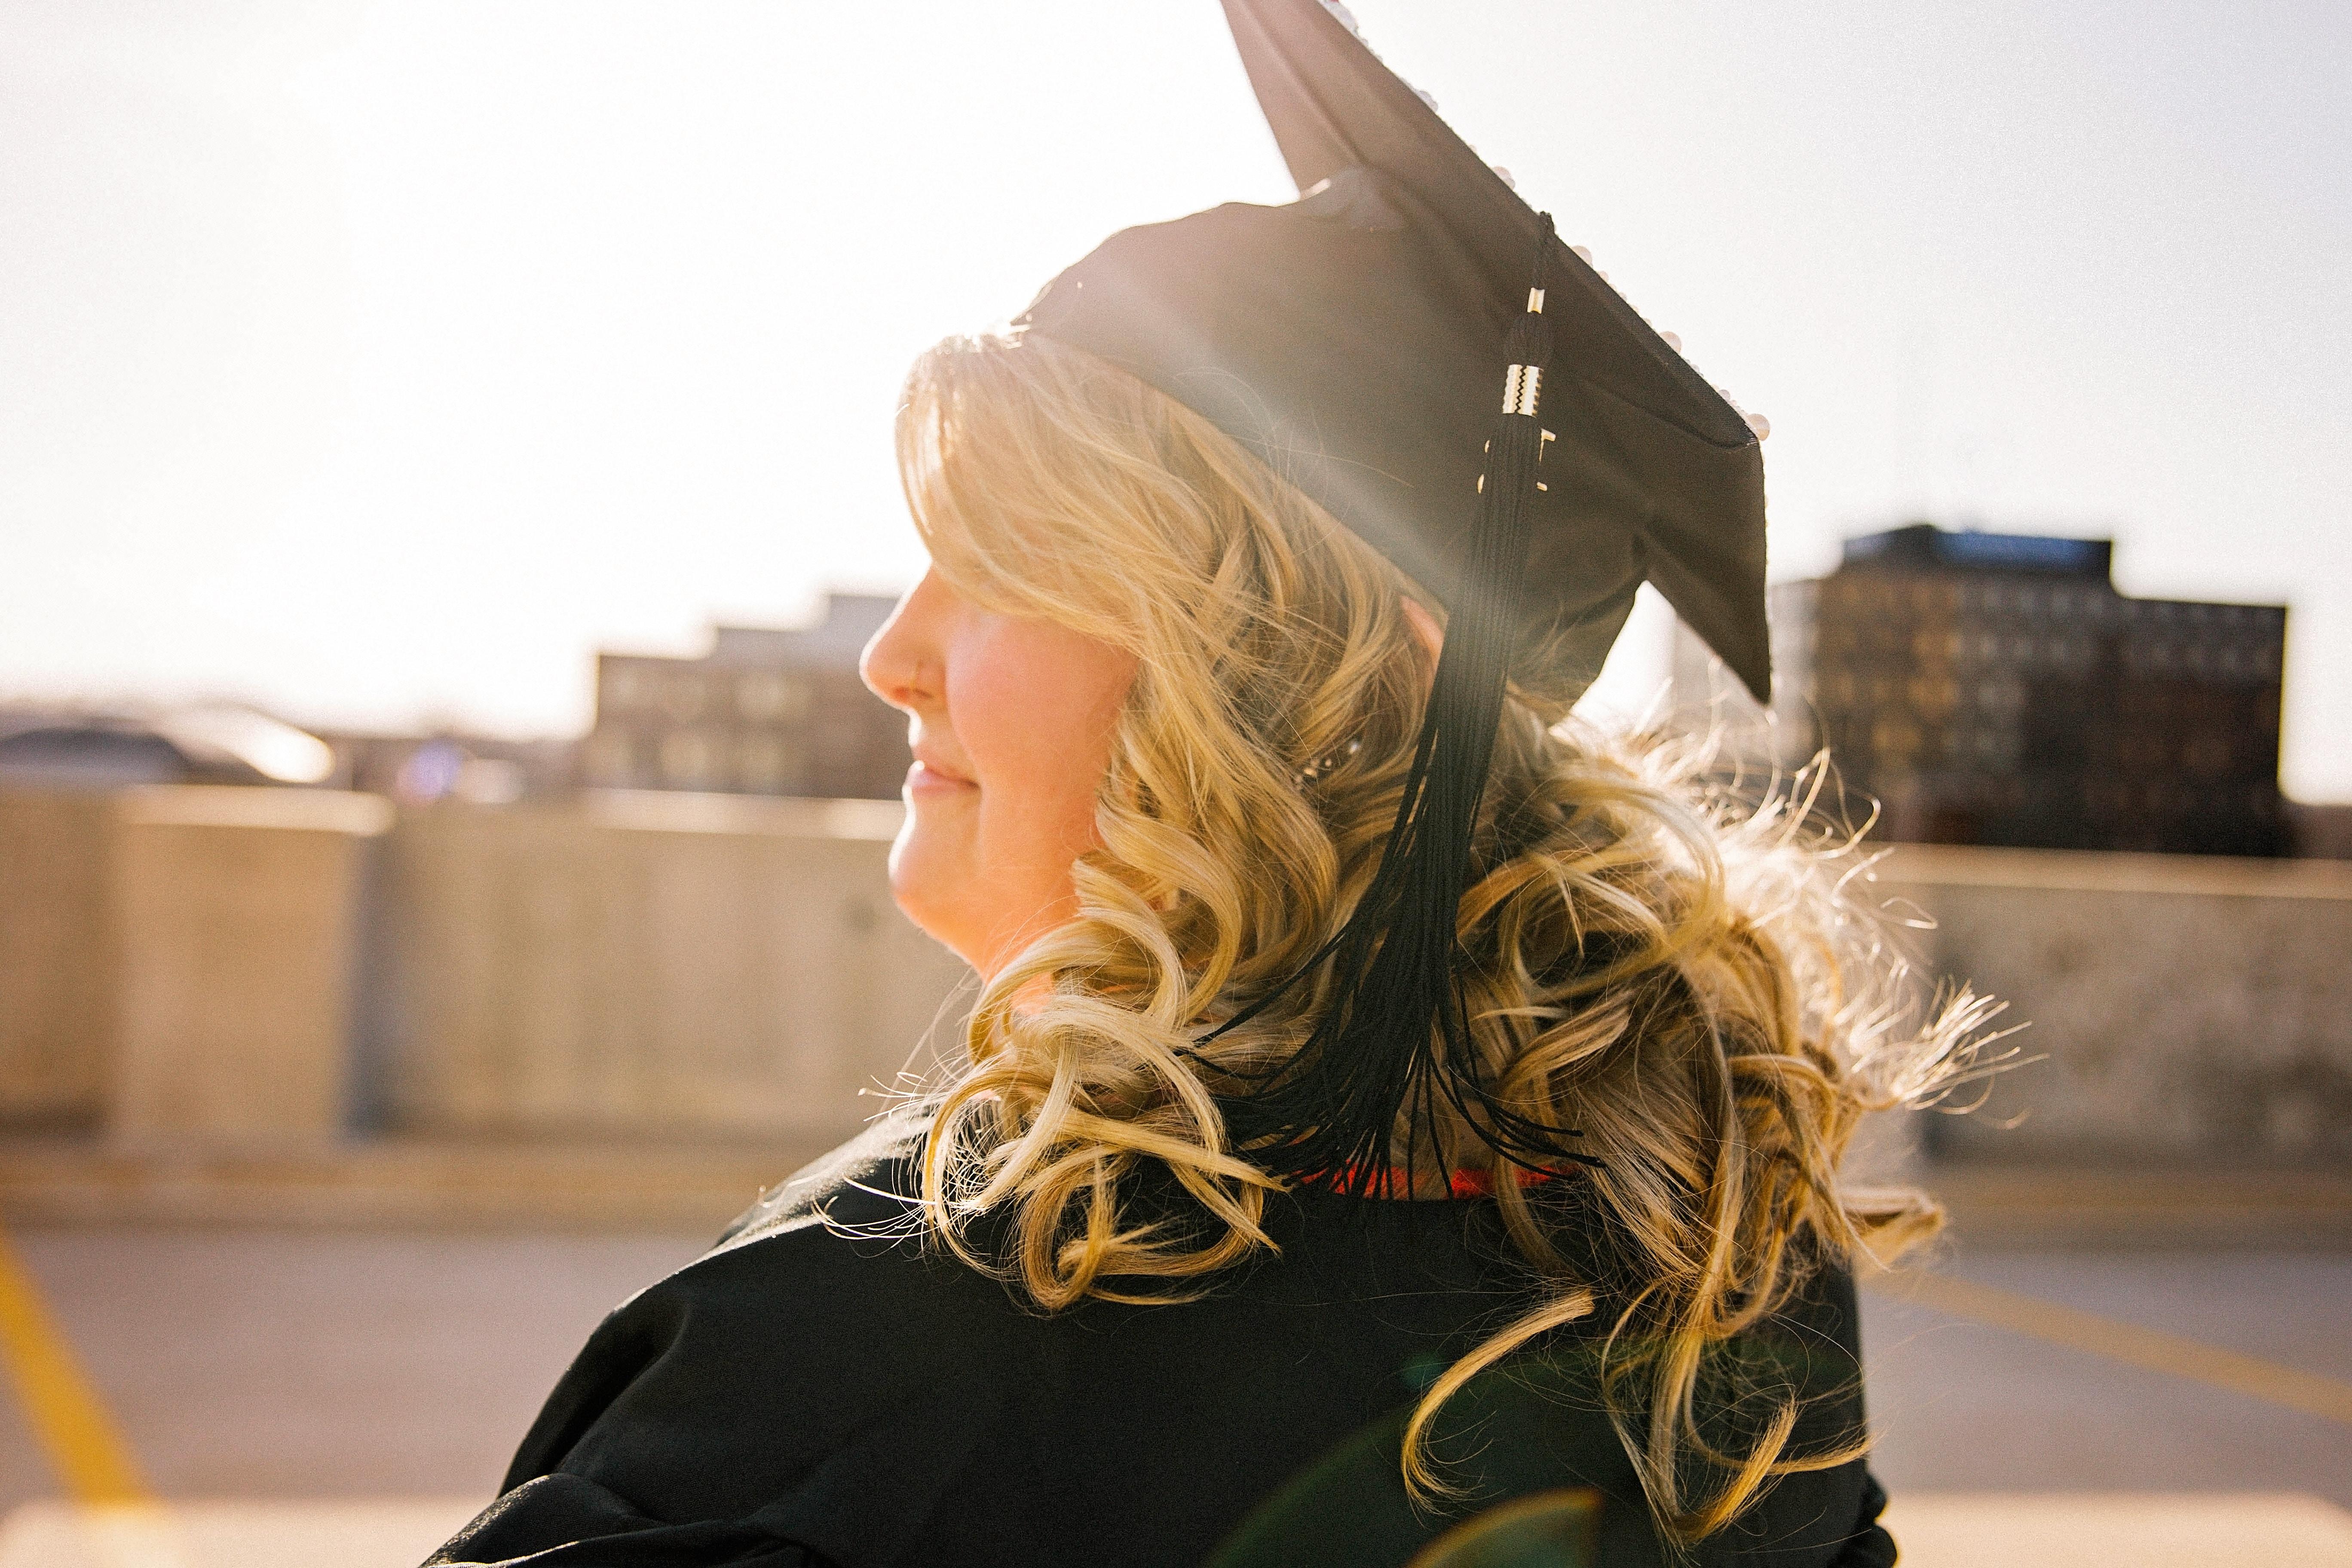 TEFL teaching degree